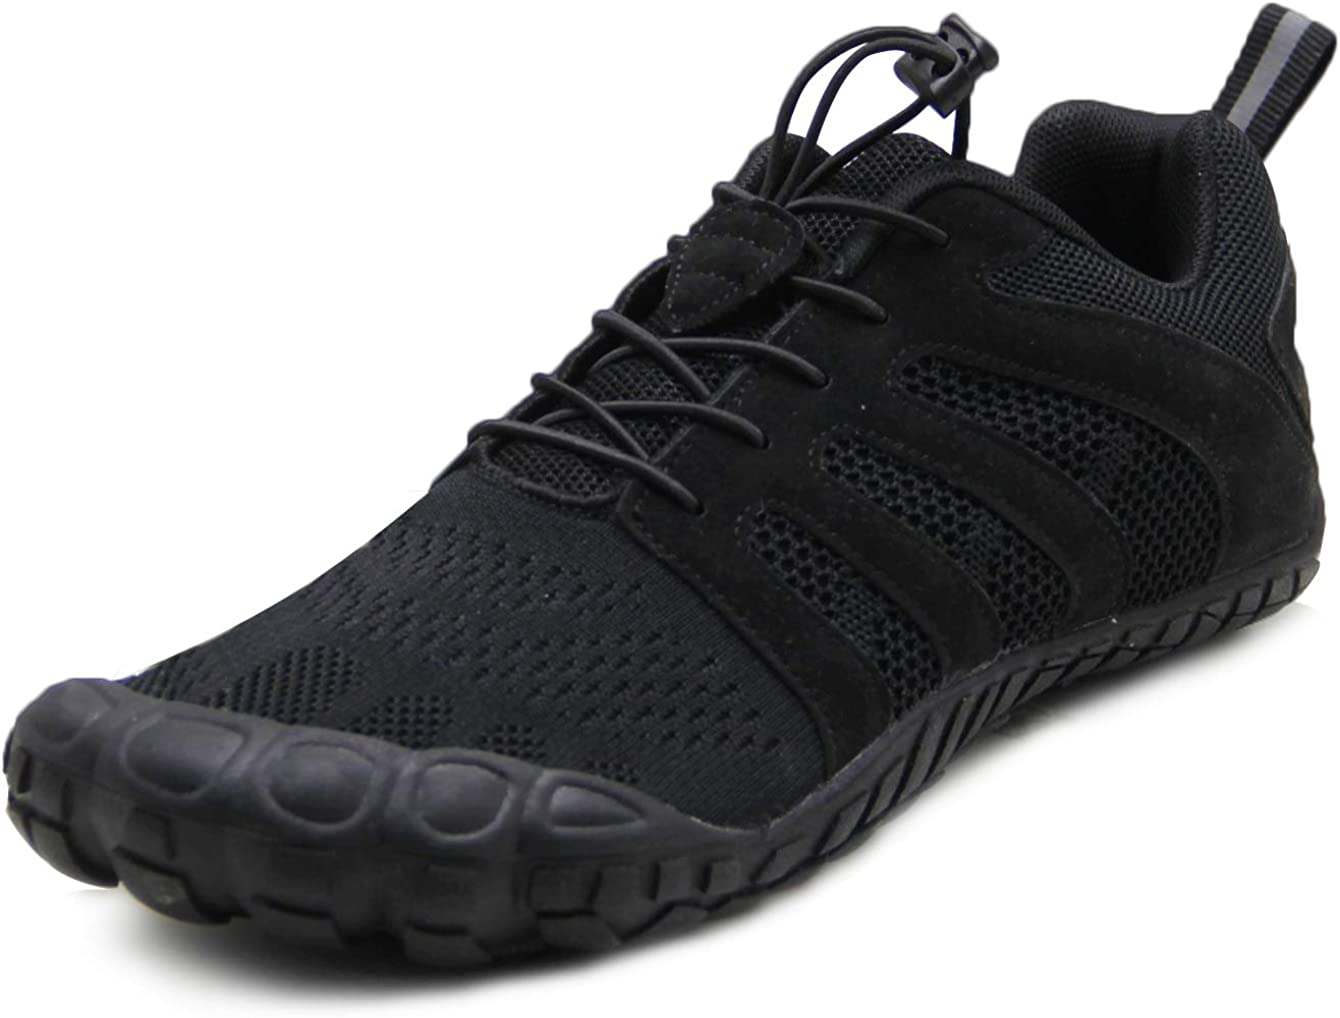 Oranginer Mens Womens Barefoot Minimalist Shoes - Wide Toe Box - Cross Training Shoes